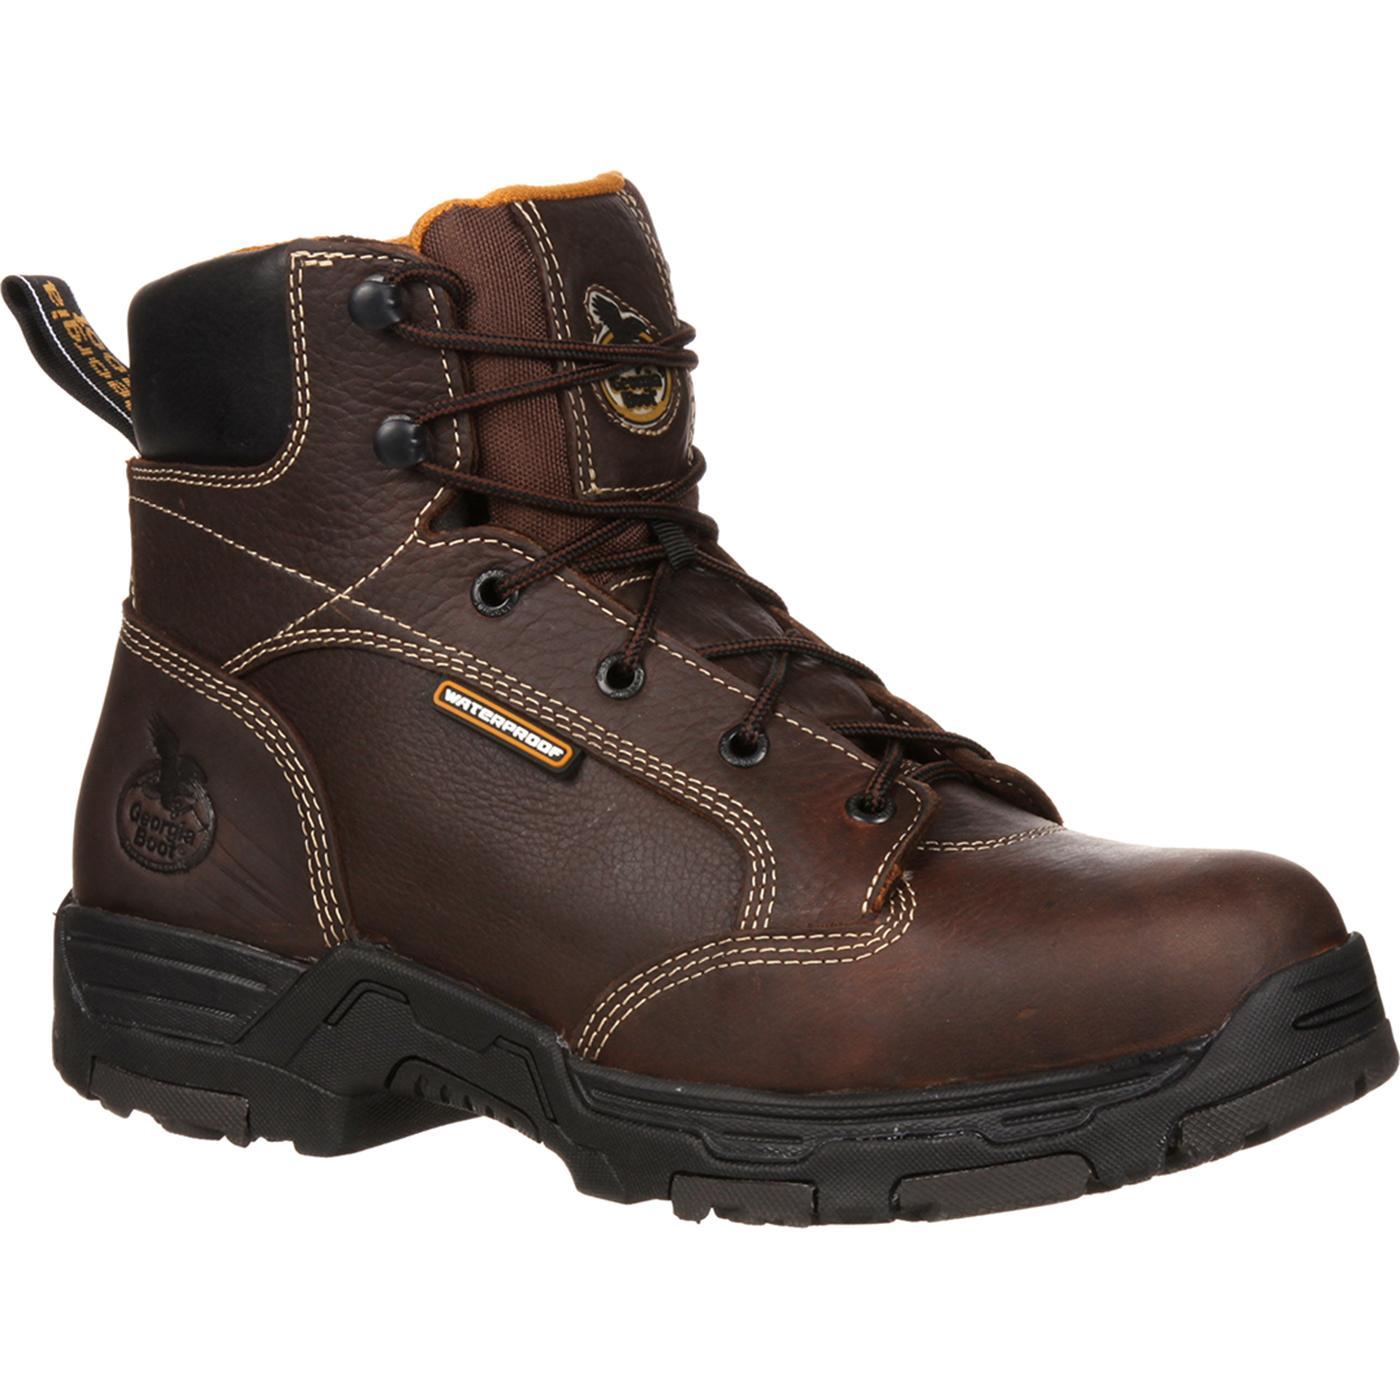 dd08c0f0769 Georgia Boot Diamond Trax Steel Toe Puncture-Resistant Waterproof Work Boot